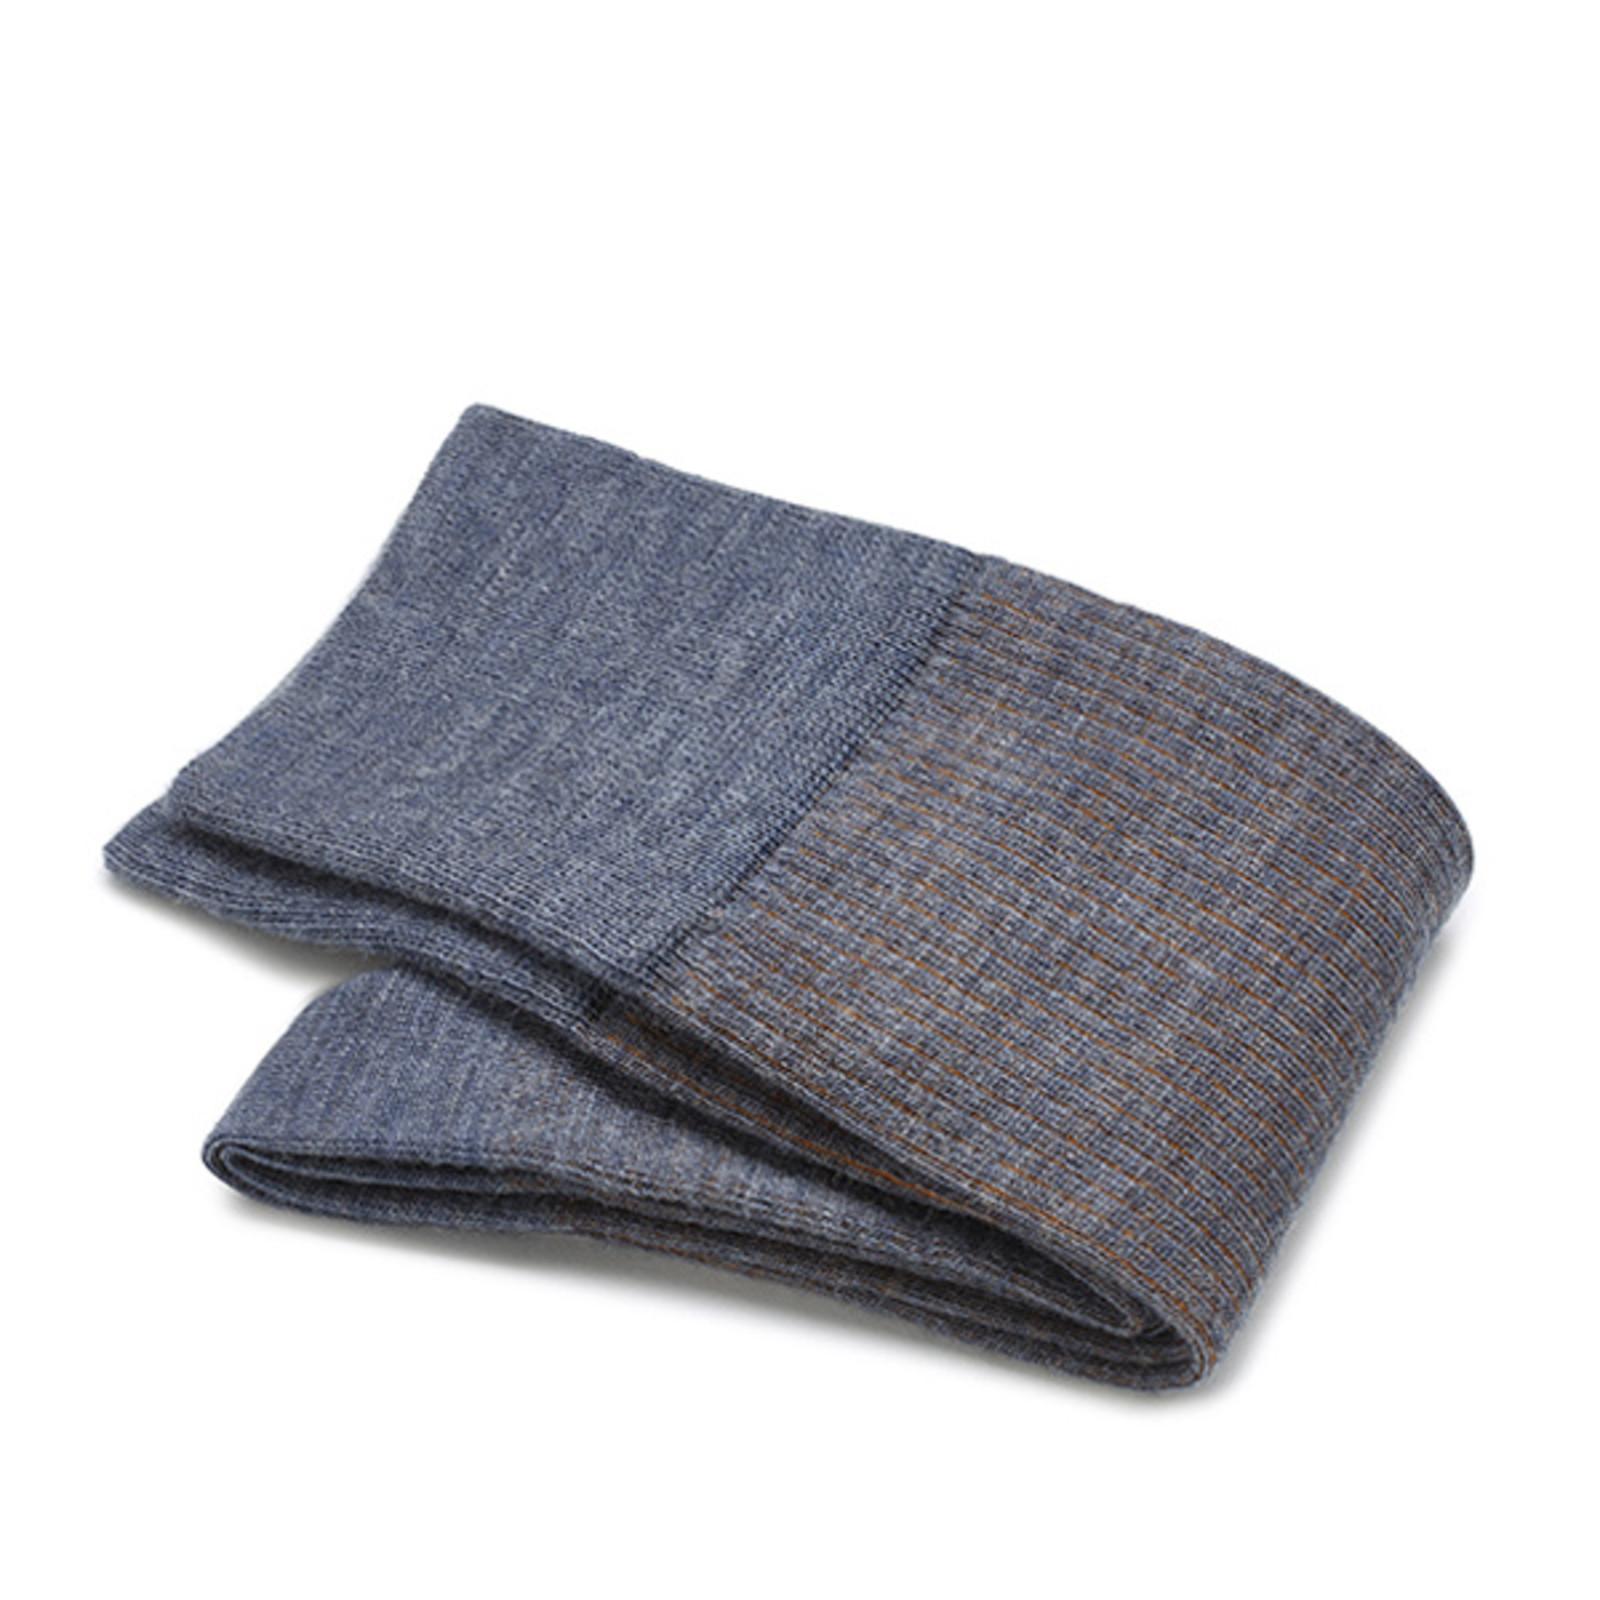 Carlo Lanza Hellblaue shadow Socken Merino Wolle